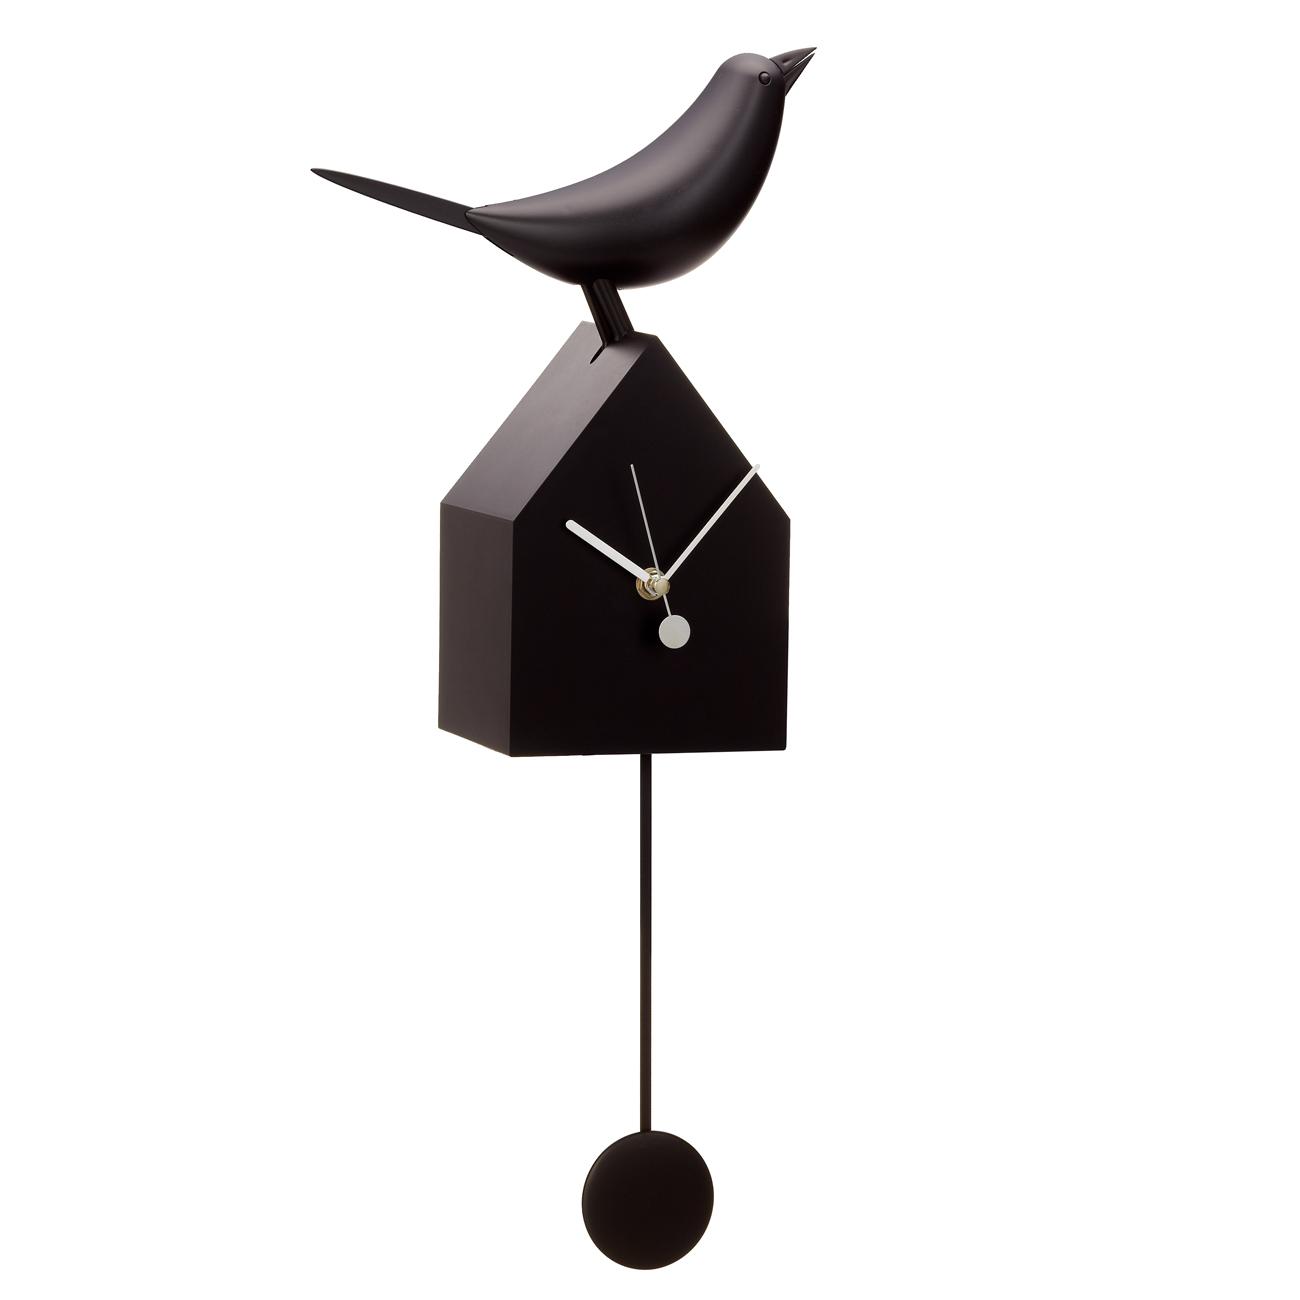 Motion Birdhouse Clocks with Removable Pendulum | alvaluz.com